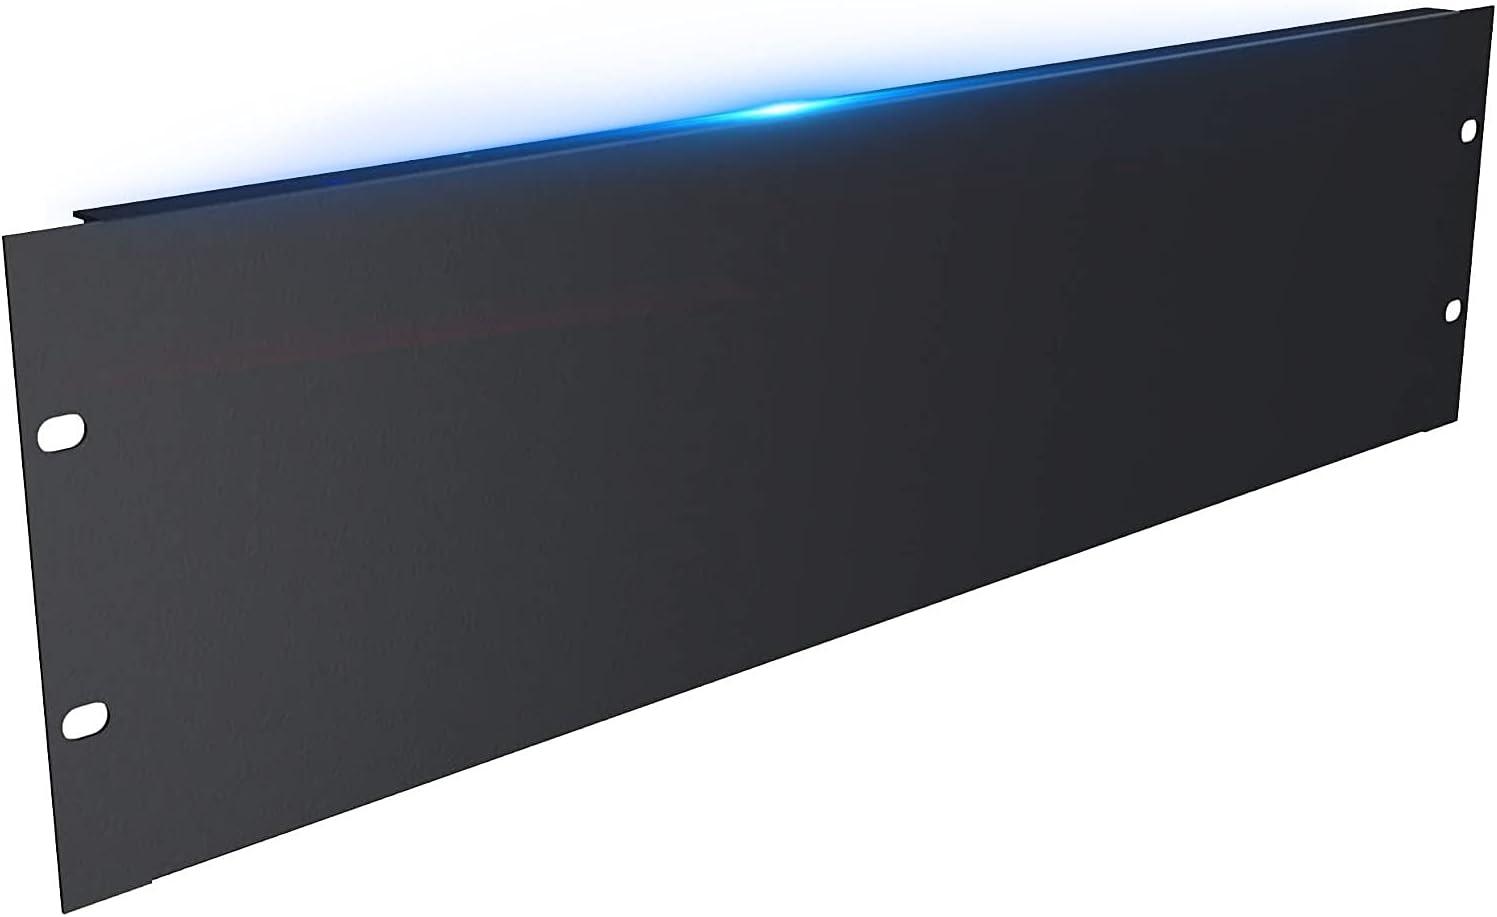 3U Black Blank Rack Mount Panel partition, Suitable for 19-inch Server Network Rack Cabinet